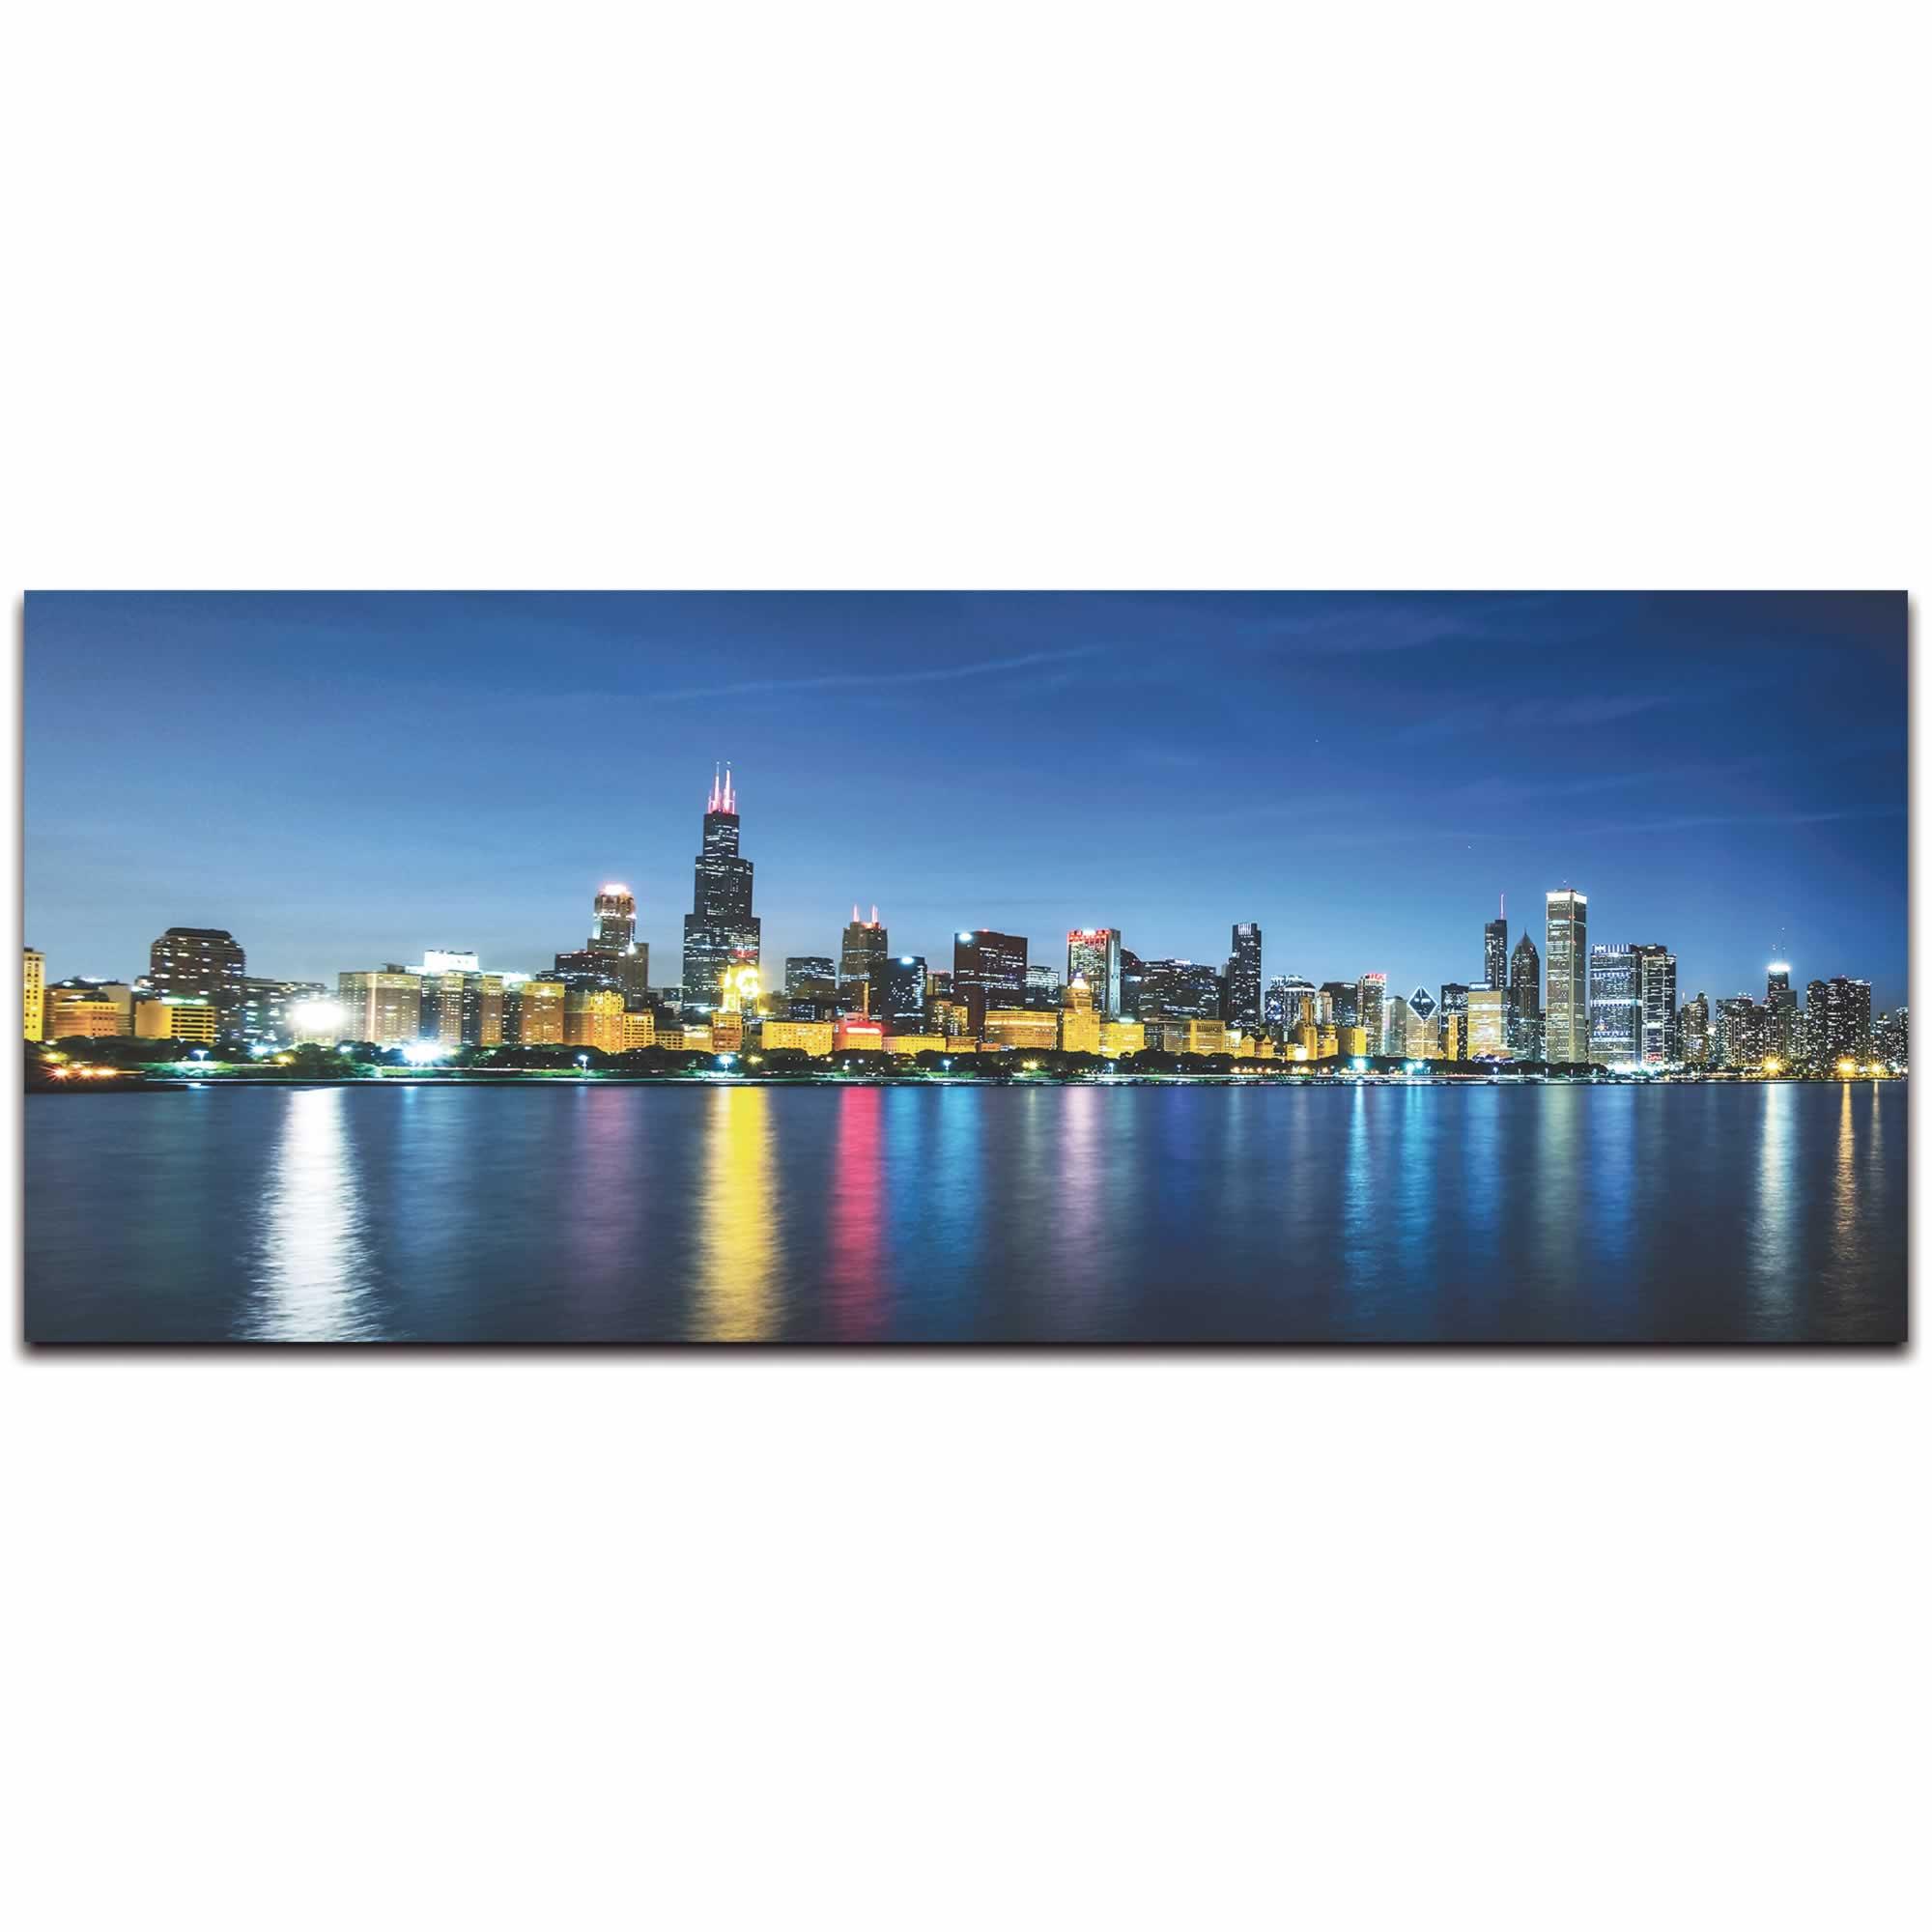 Chicago City Skyline - Urban Modern Art, Designer Home Decor, Cityscape Wall Artwork, Trendy Contemporary Art - Alternate View 2